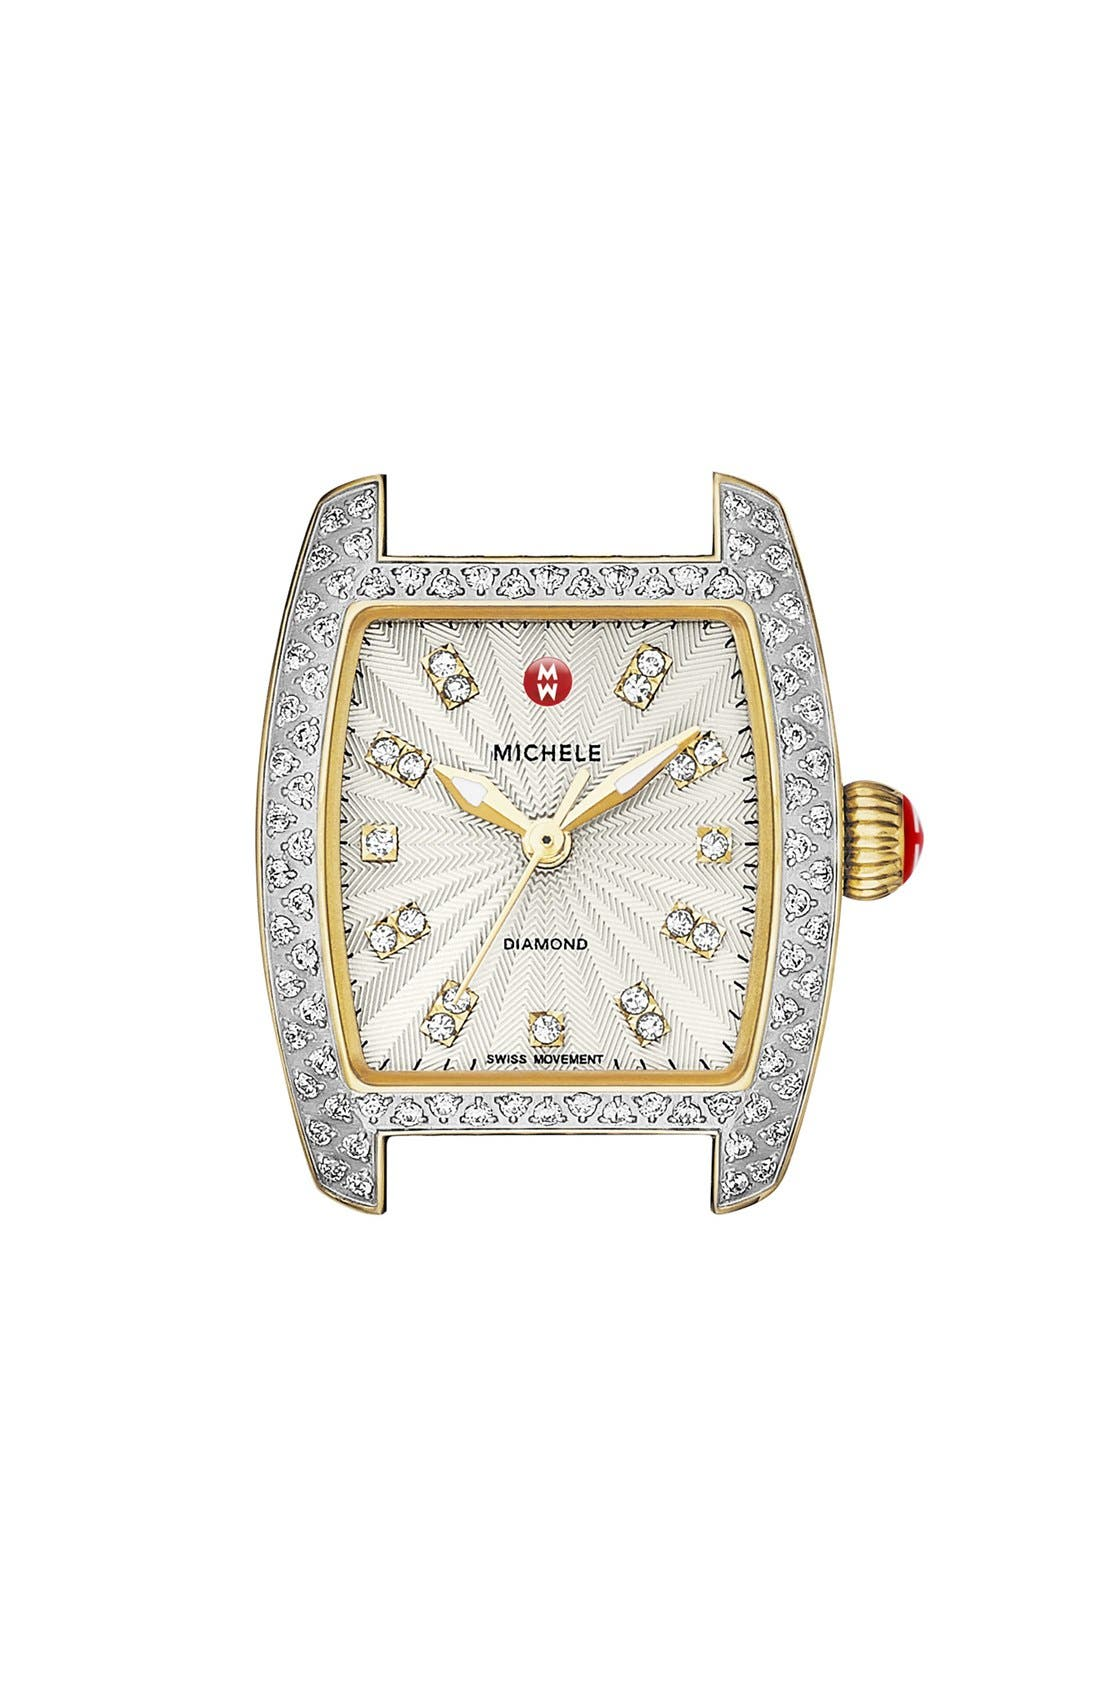 Main Image - MICHELE 'Urban Petite Diamond' Diamond Dial Watch Case, 21mm x 22mm (Limited Edition)